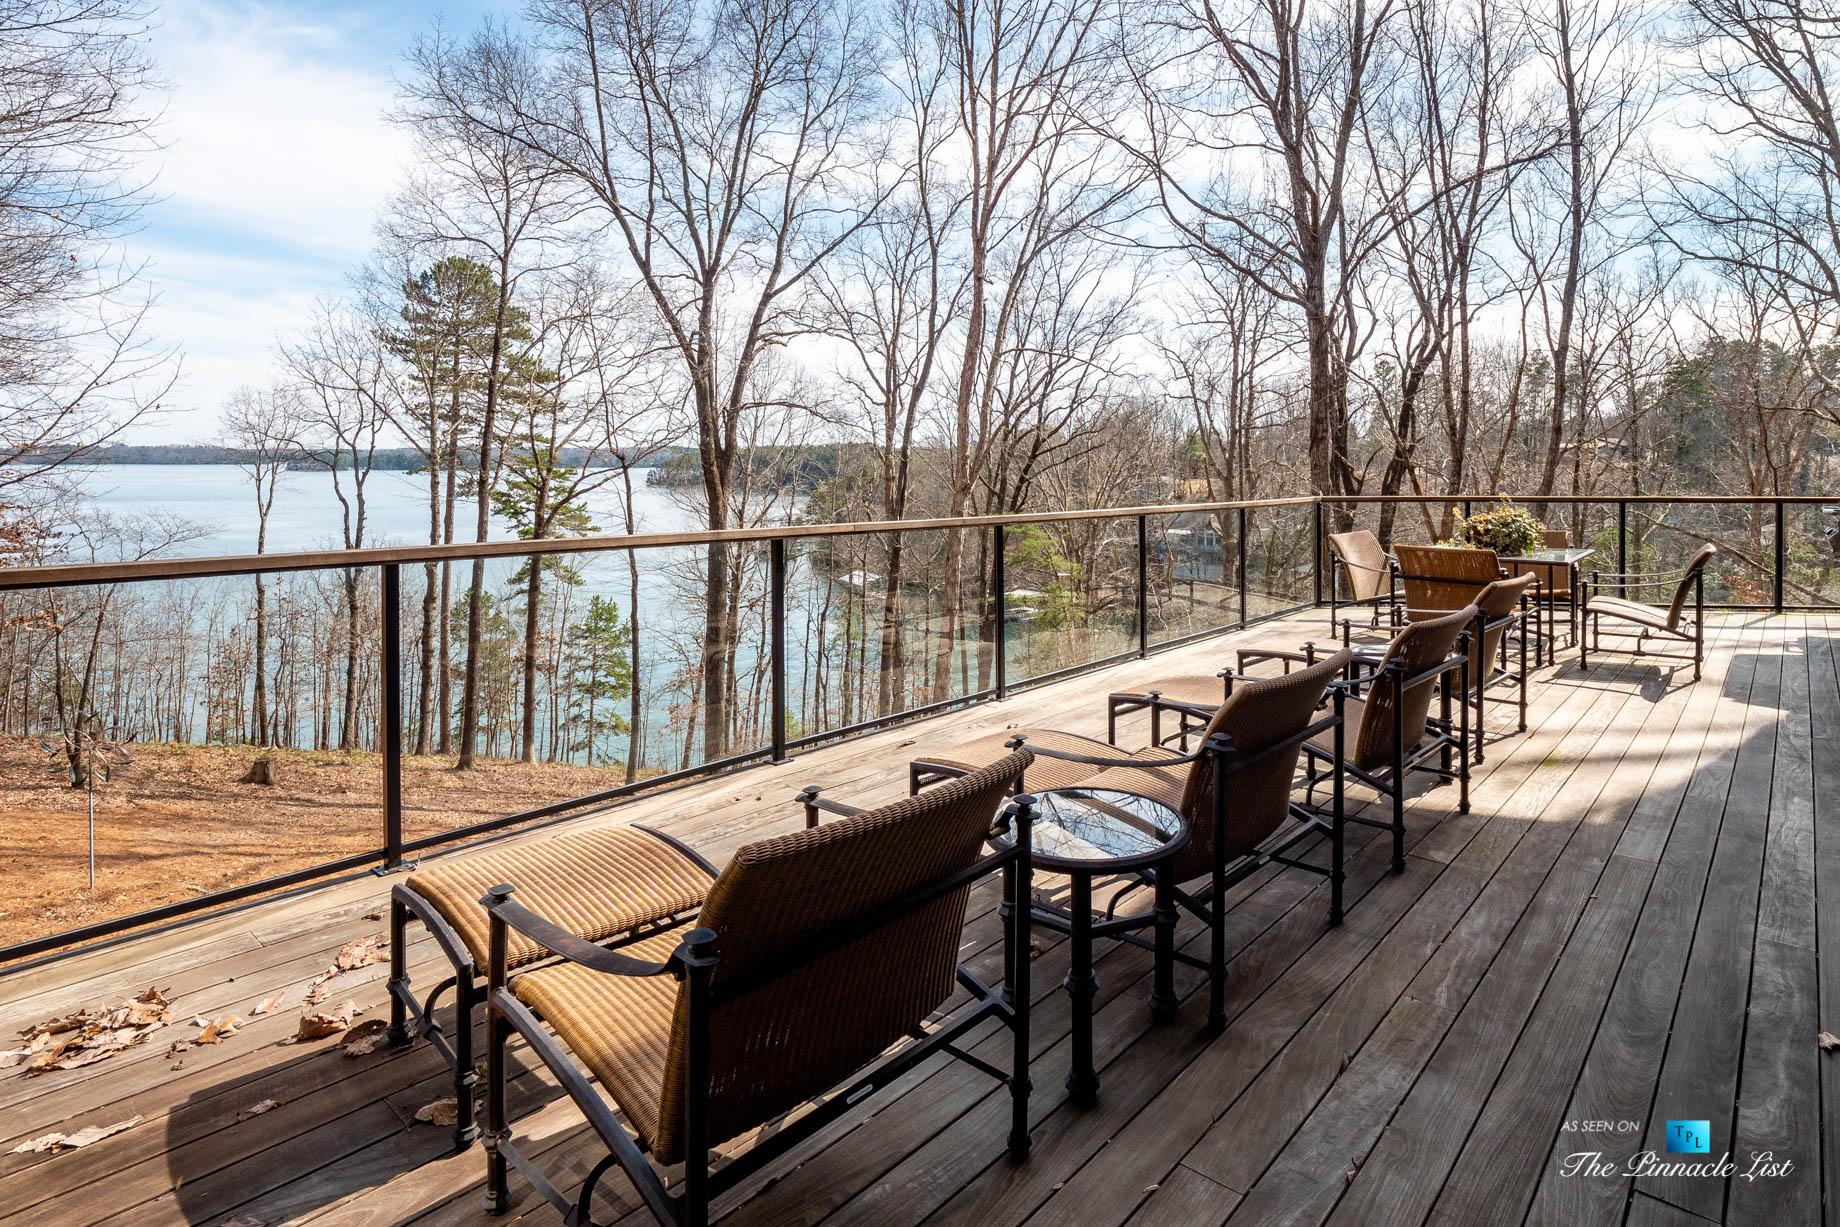 7860 Chestnut Hill Rd, Cumming, GA, USA - Exterior Deck Lake View - Luxury Real Estate - Lake Lanier Mid-Century Modern Stone Home